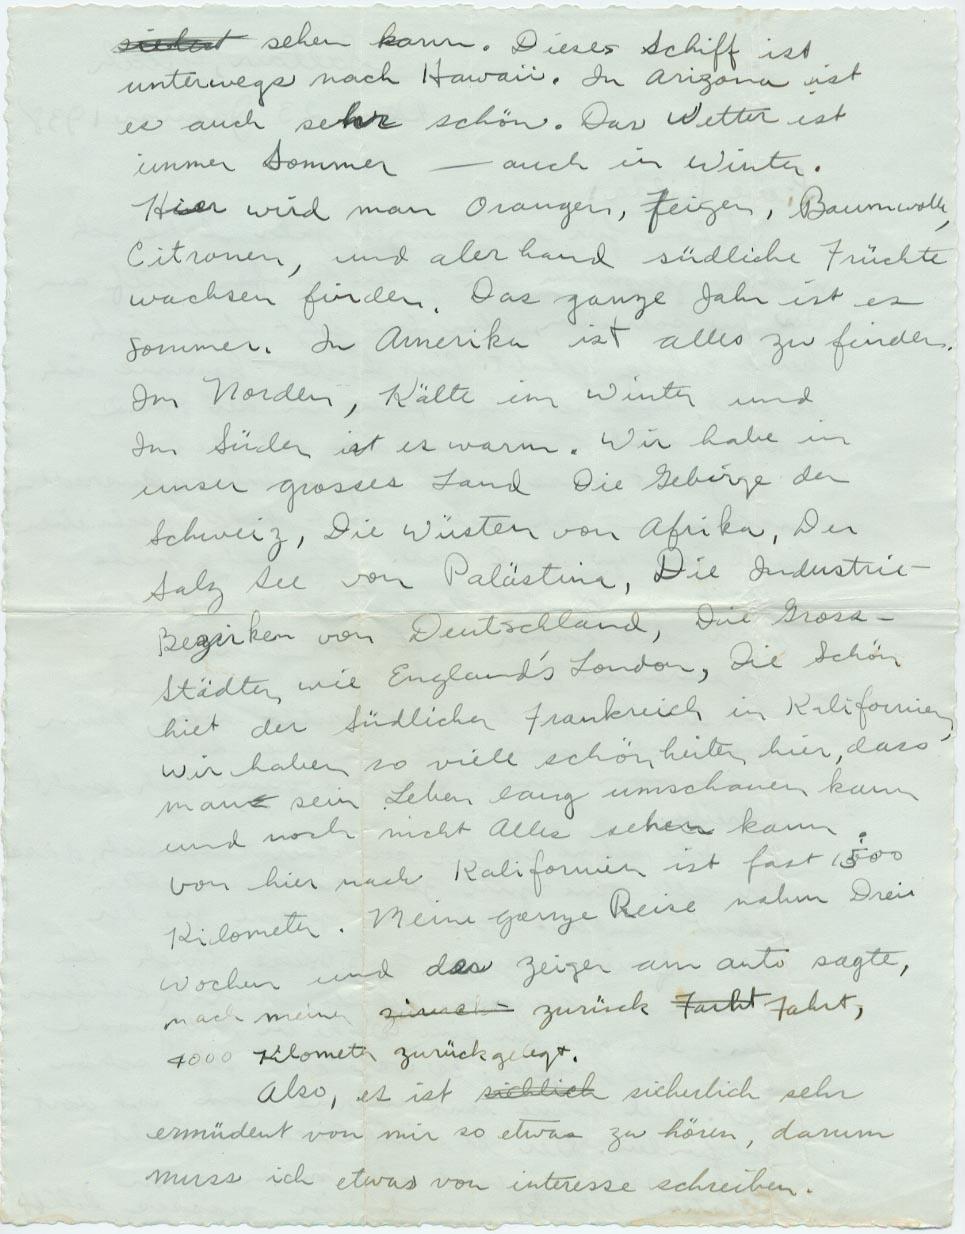 23 January 1938, p. 2